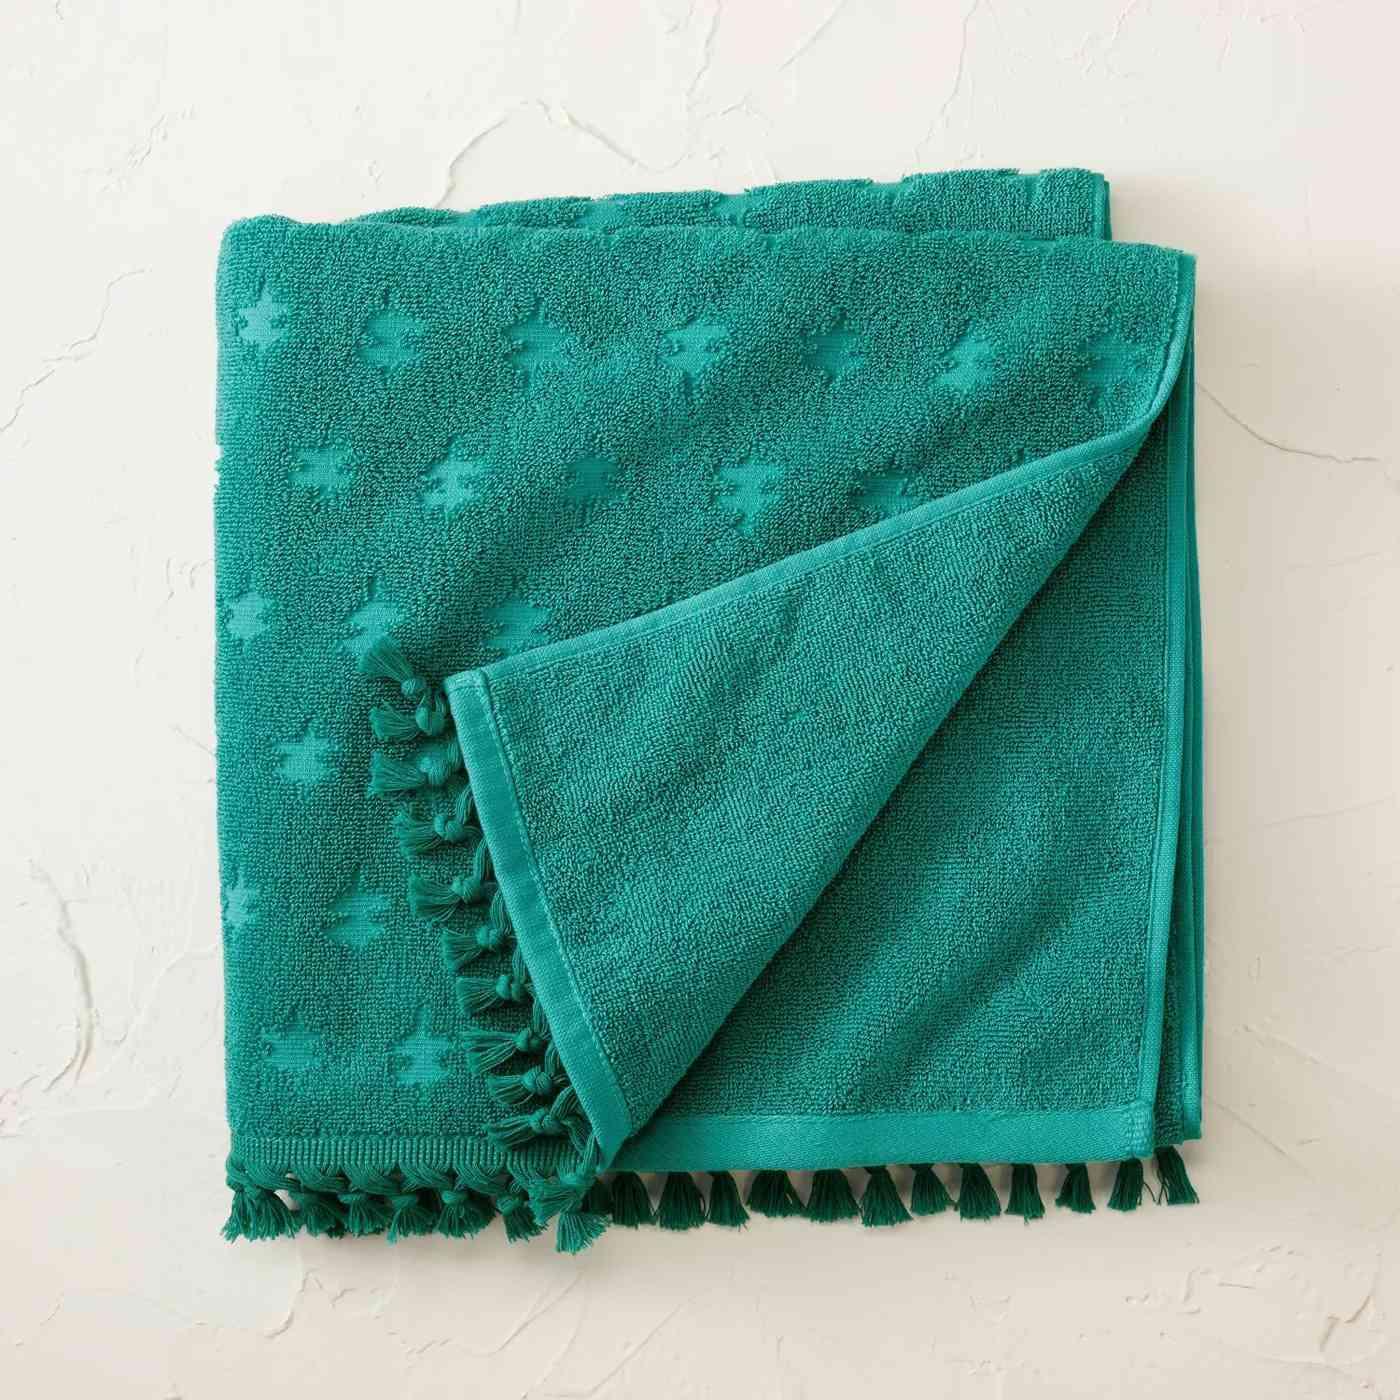 Jacquard Bath Towel with Fringe